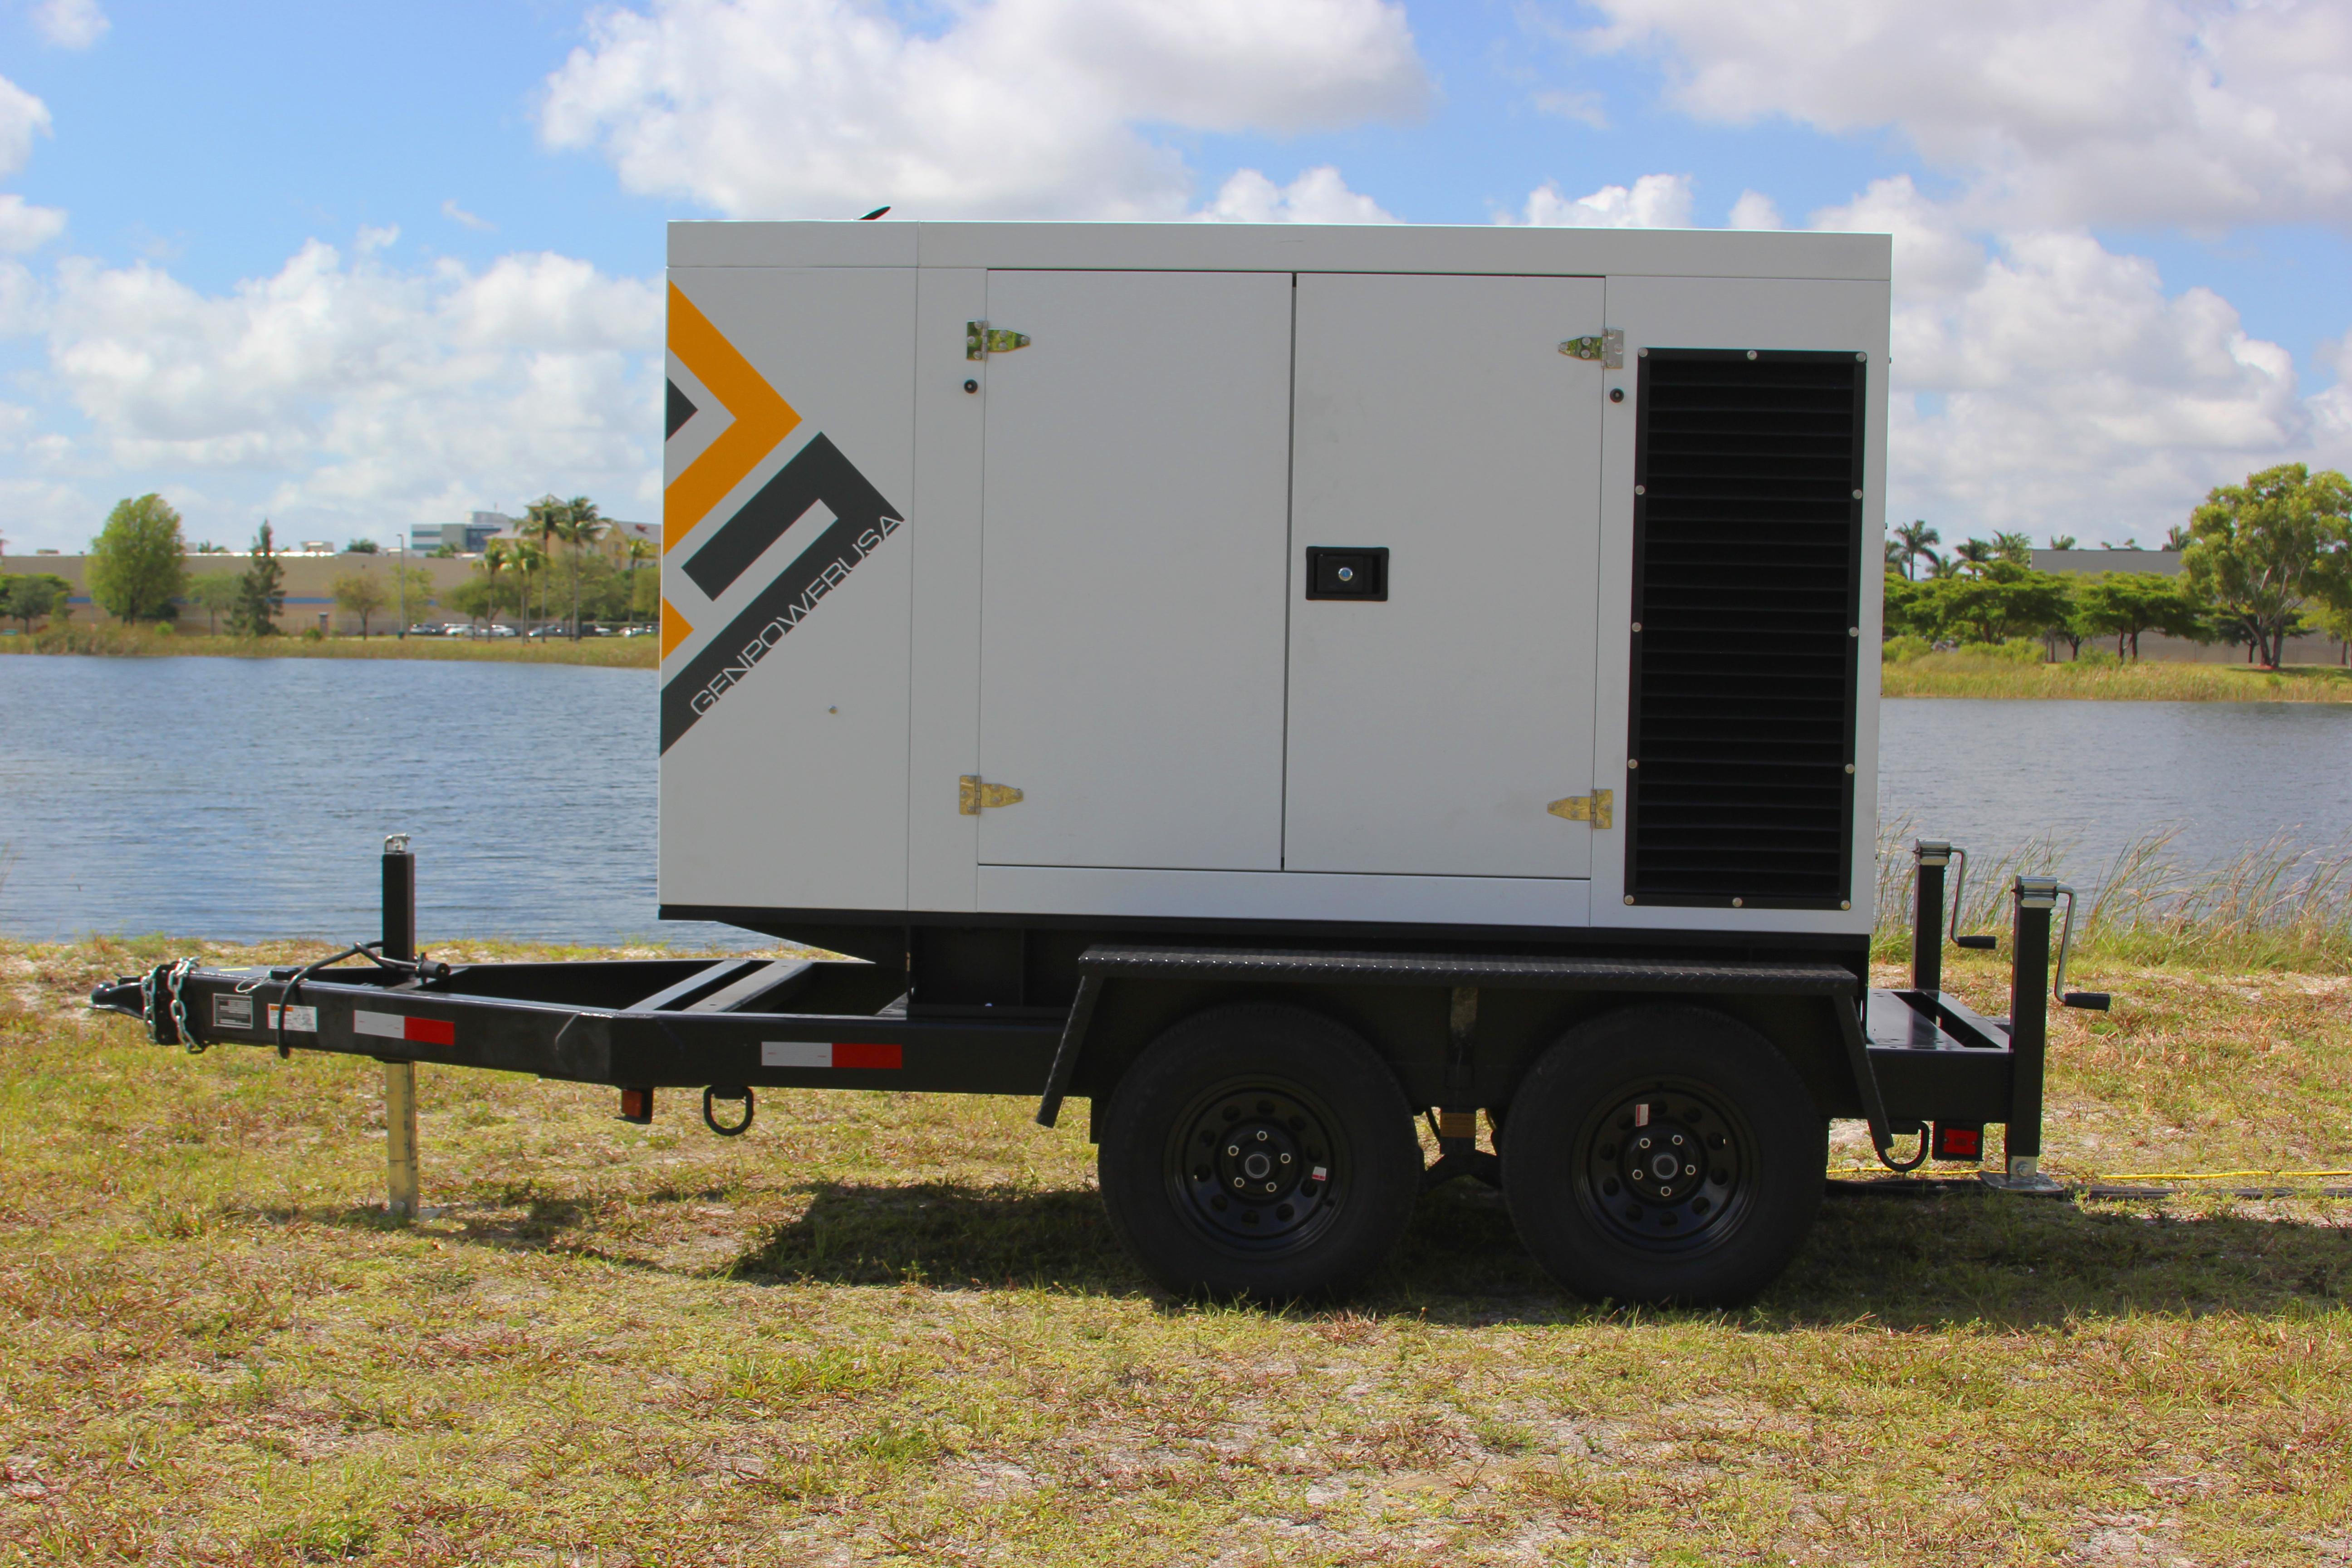 A GENPOWERUSA generator, made in the U.S.A.